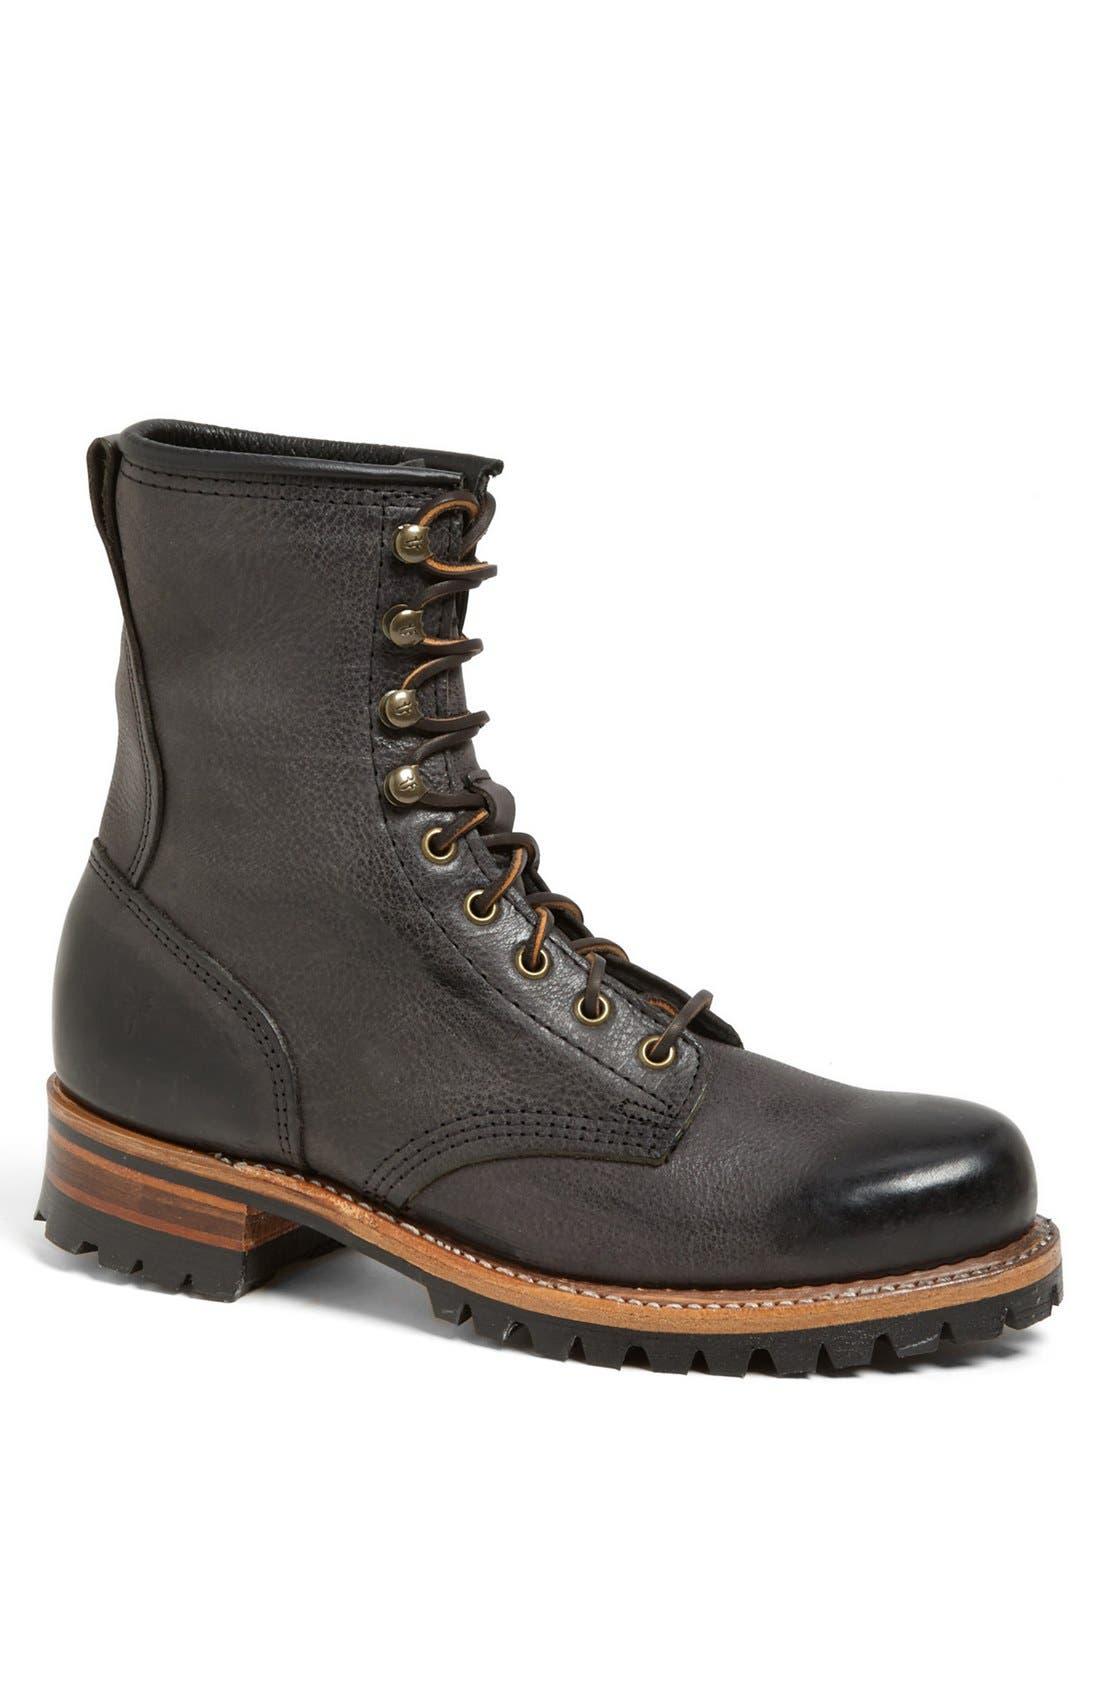 Alternate Image 1 Selected - Frye 'Logger' Boot